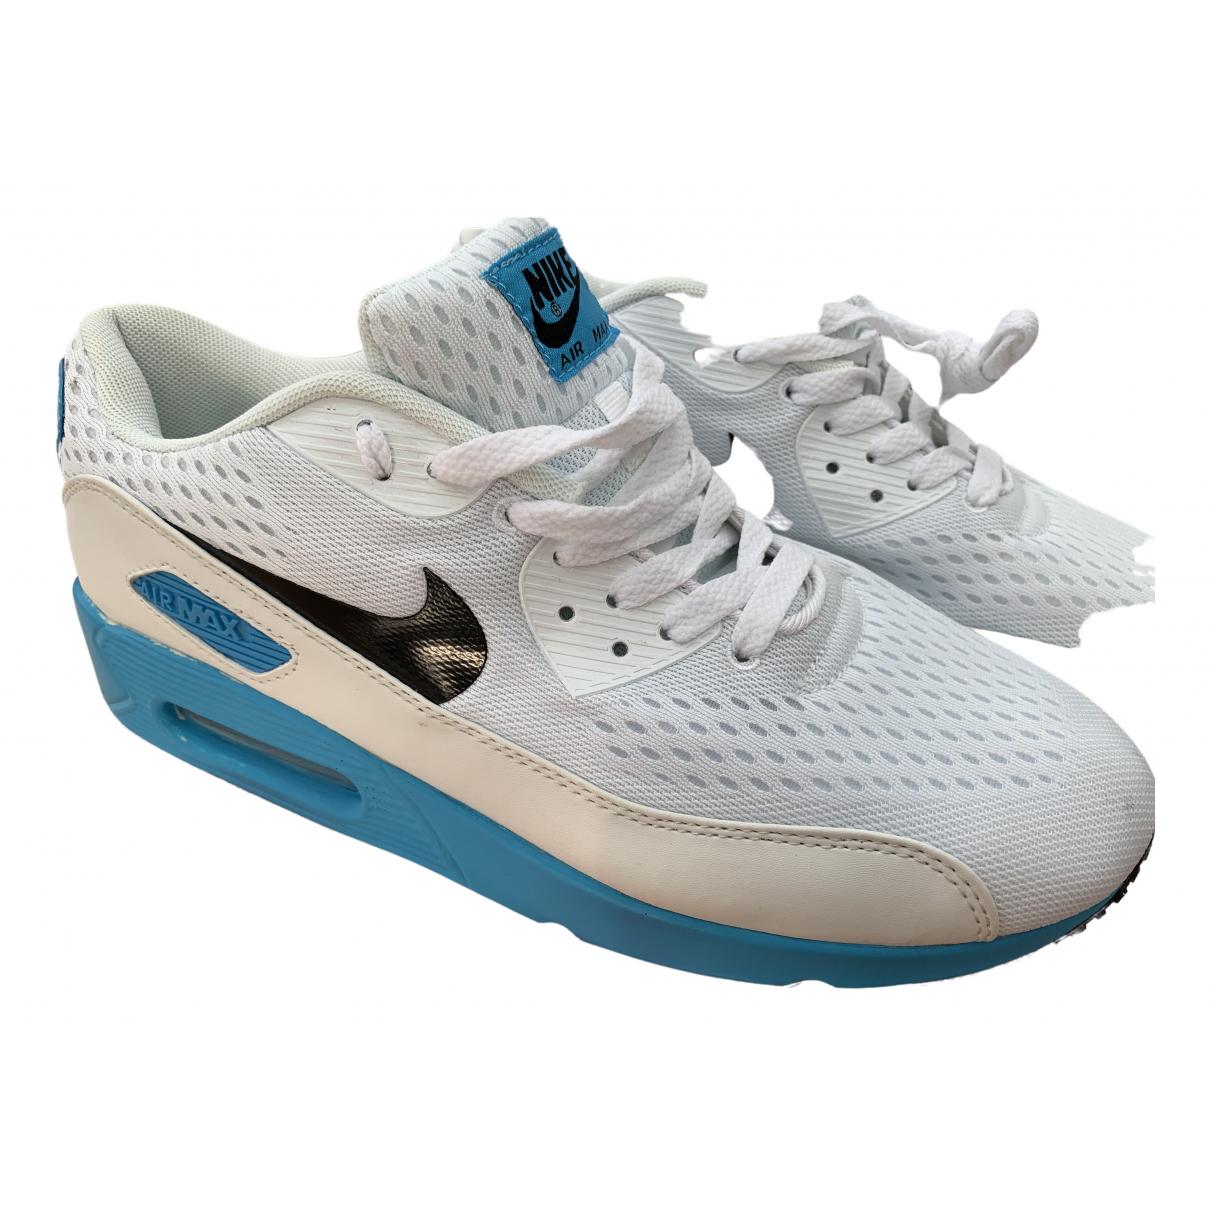 Nike Air Max 90 White Cloth Trainers for Men 46 EU